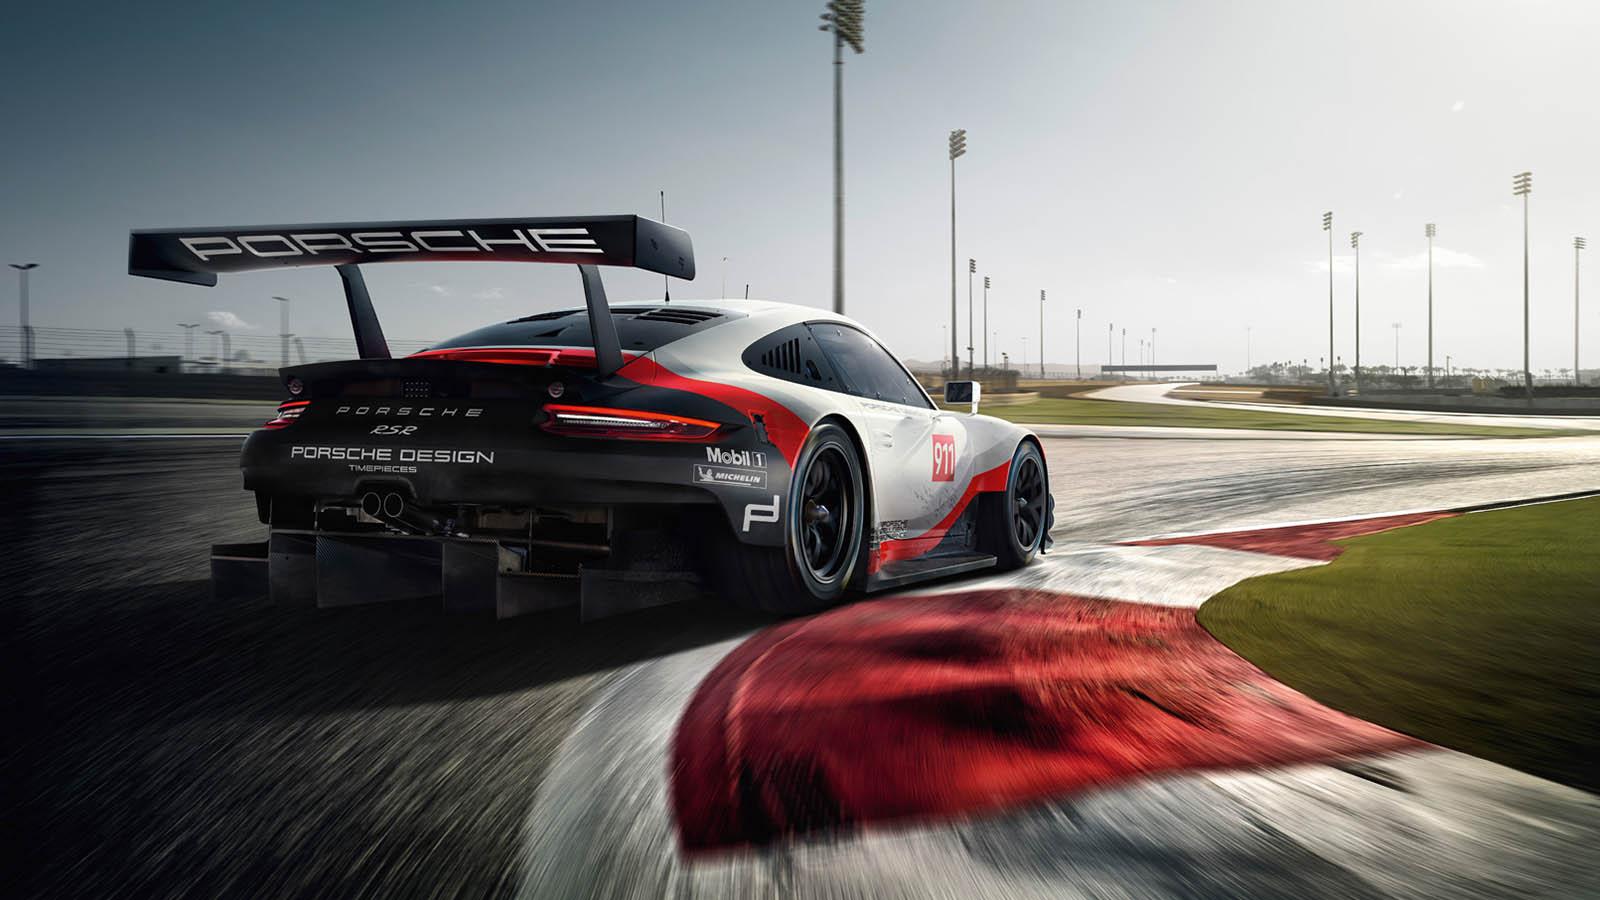 Stunning Porsche 911 RSR